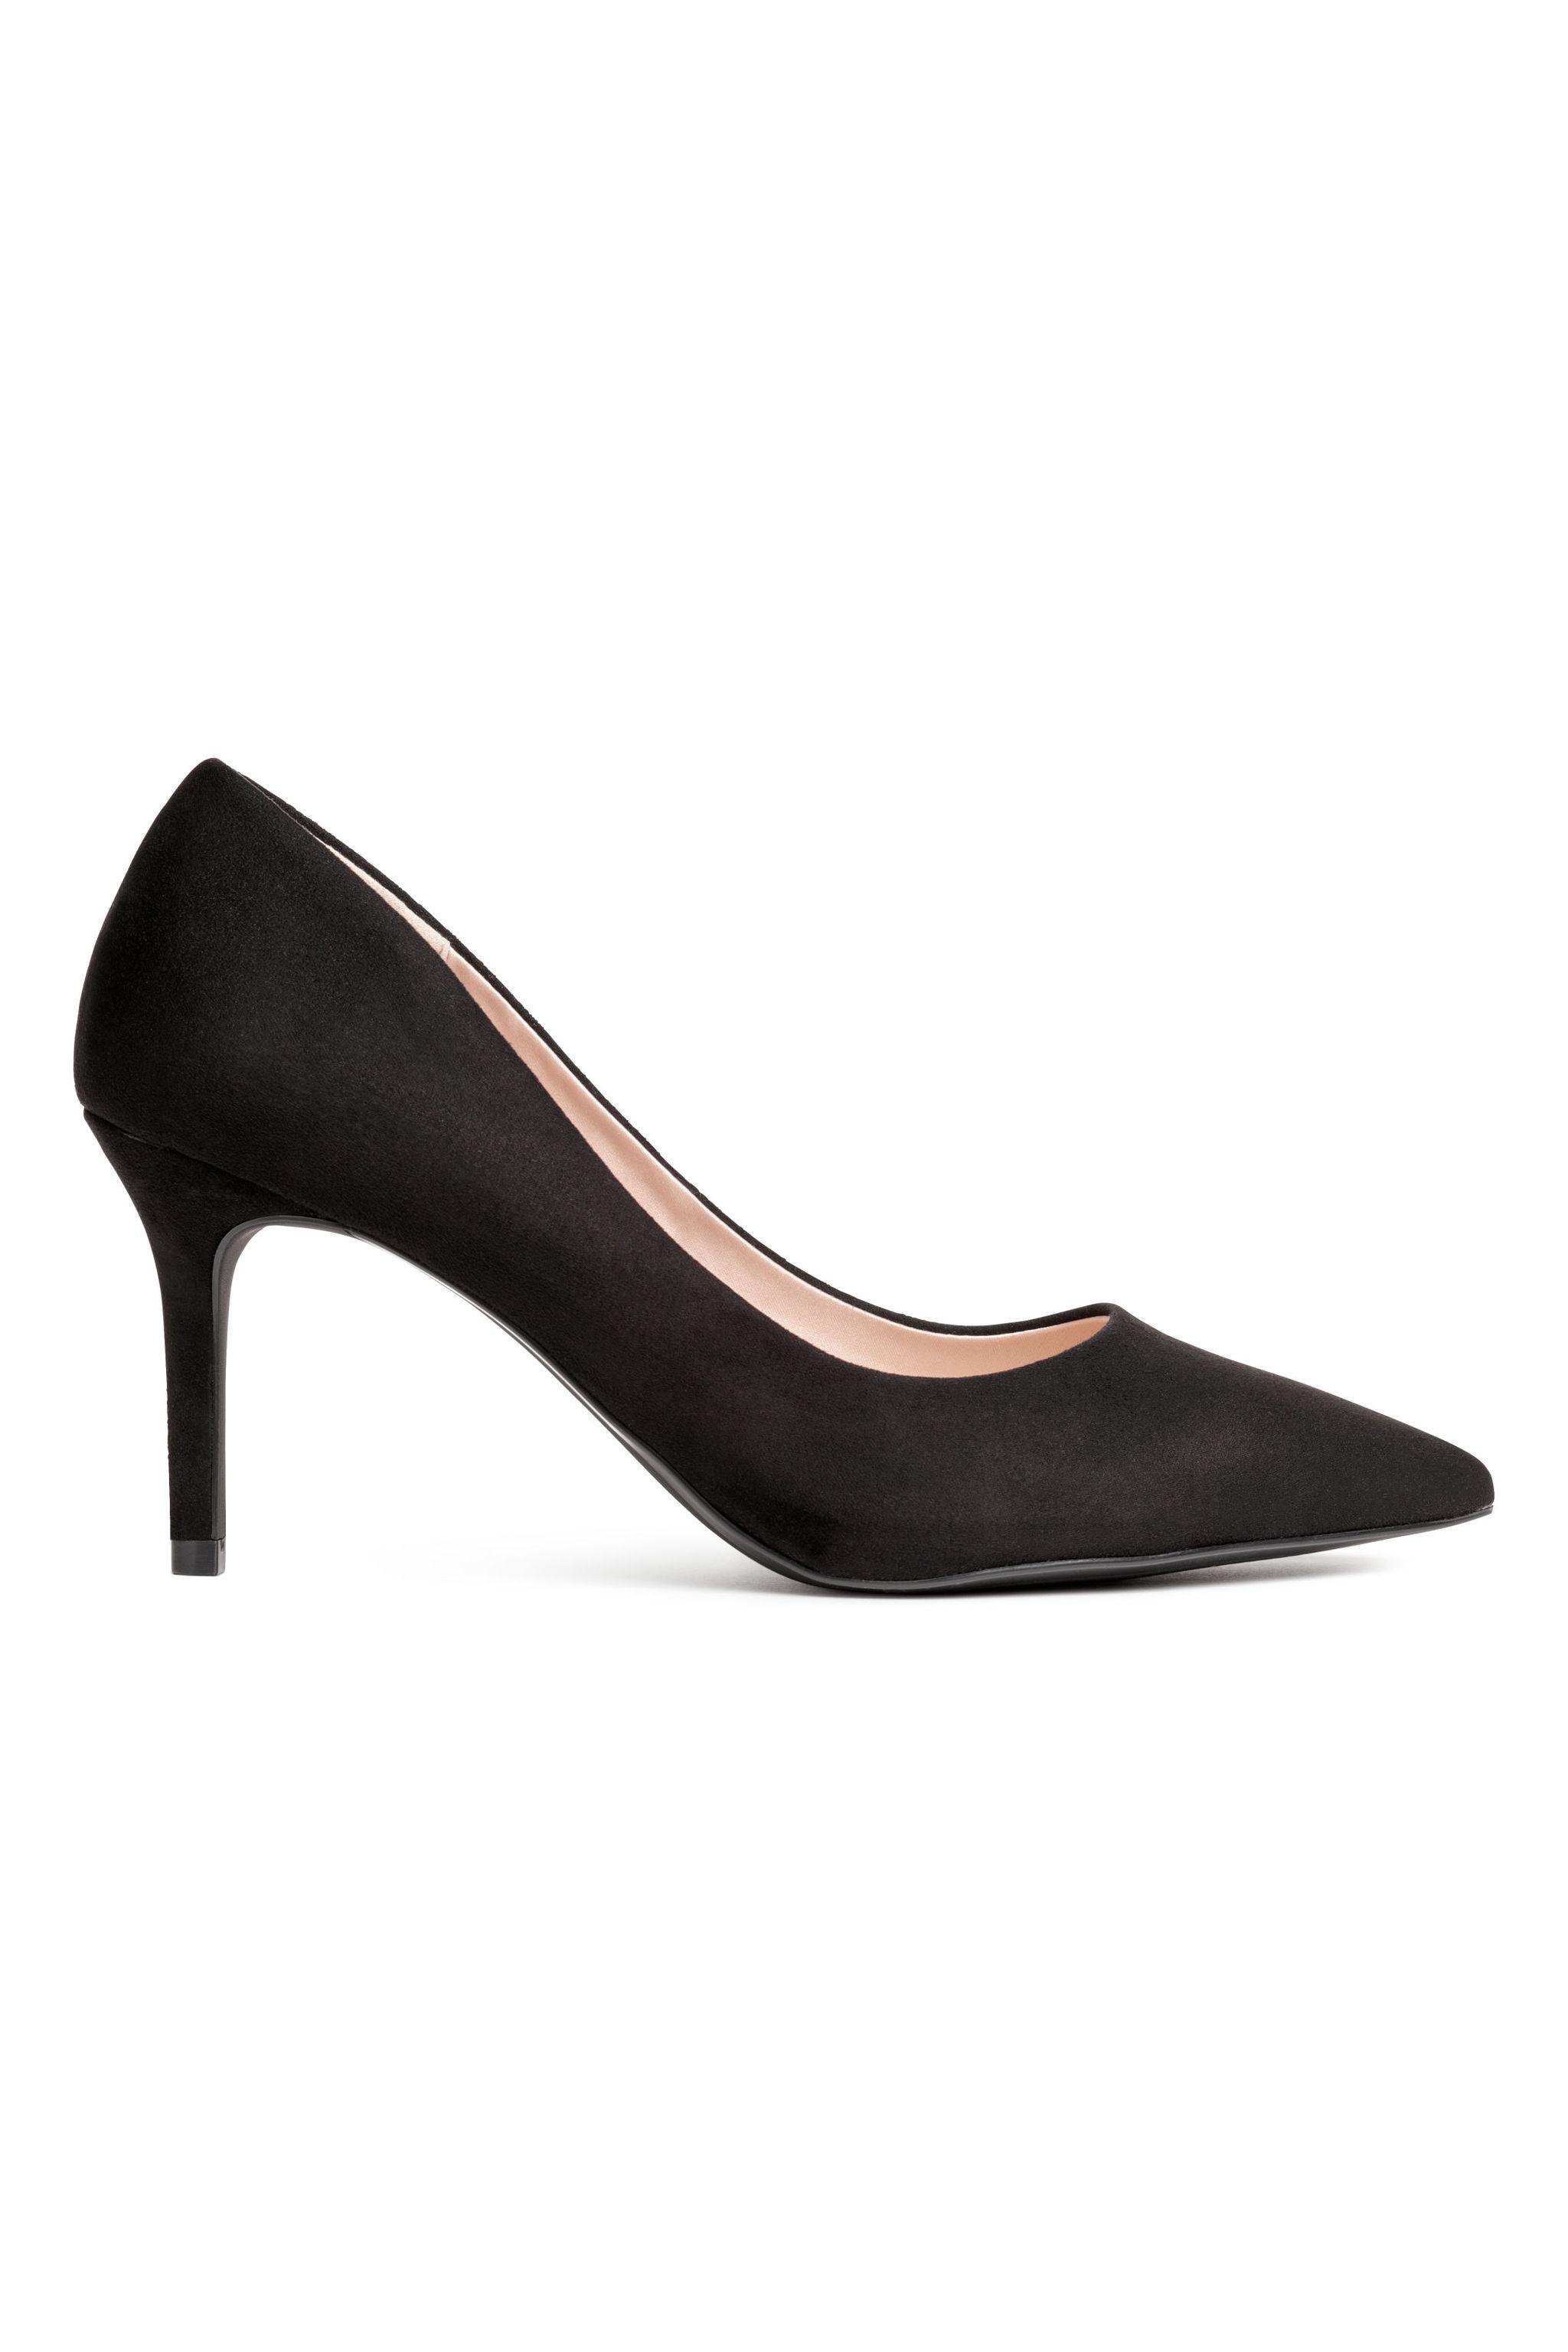 Salones negros de H&M (19,99 euros)